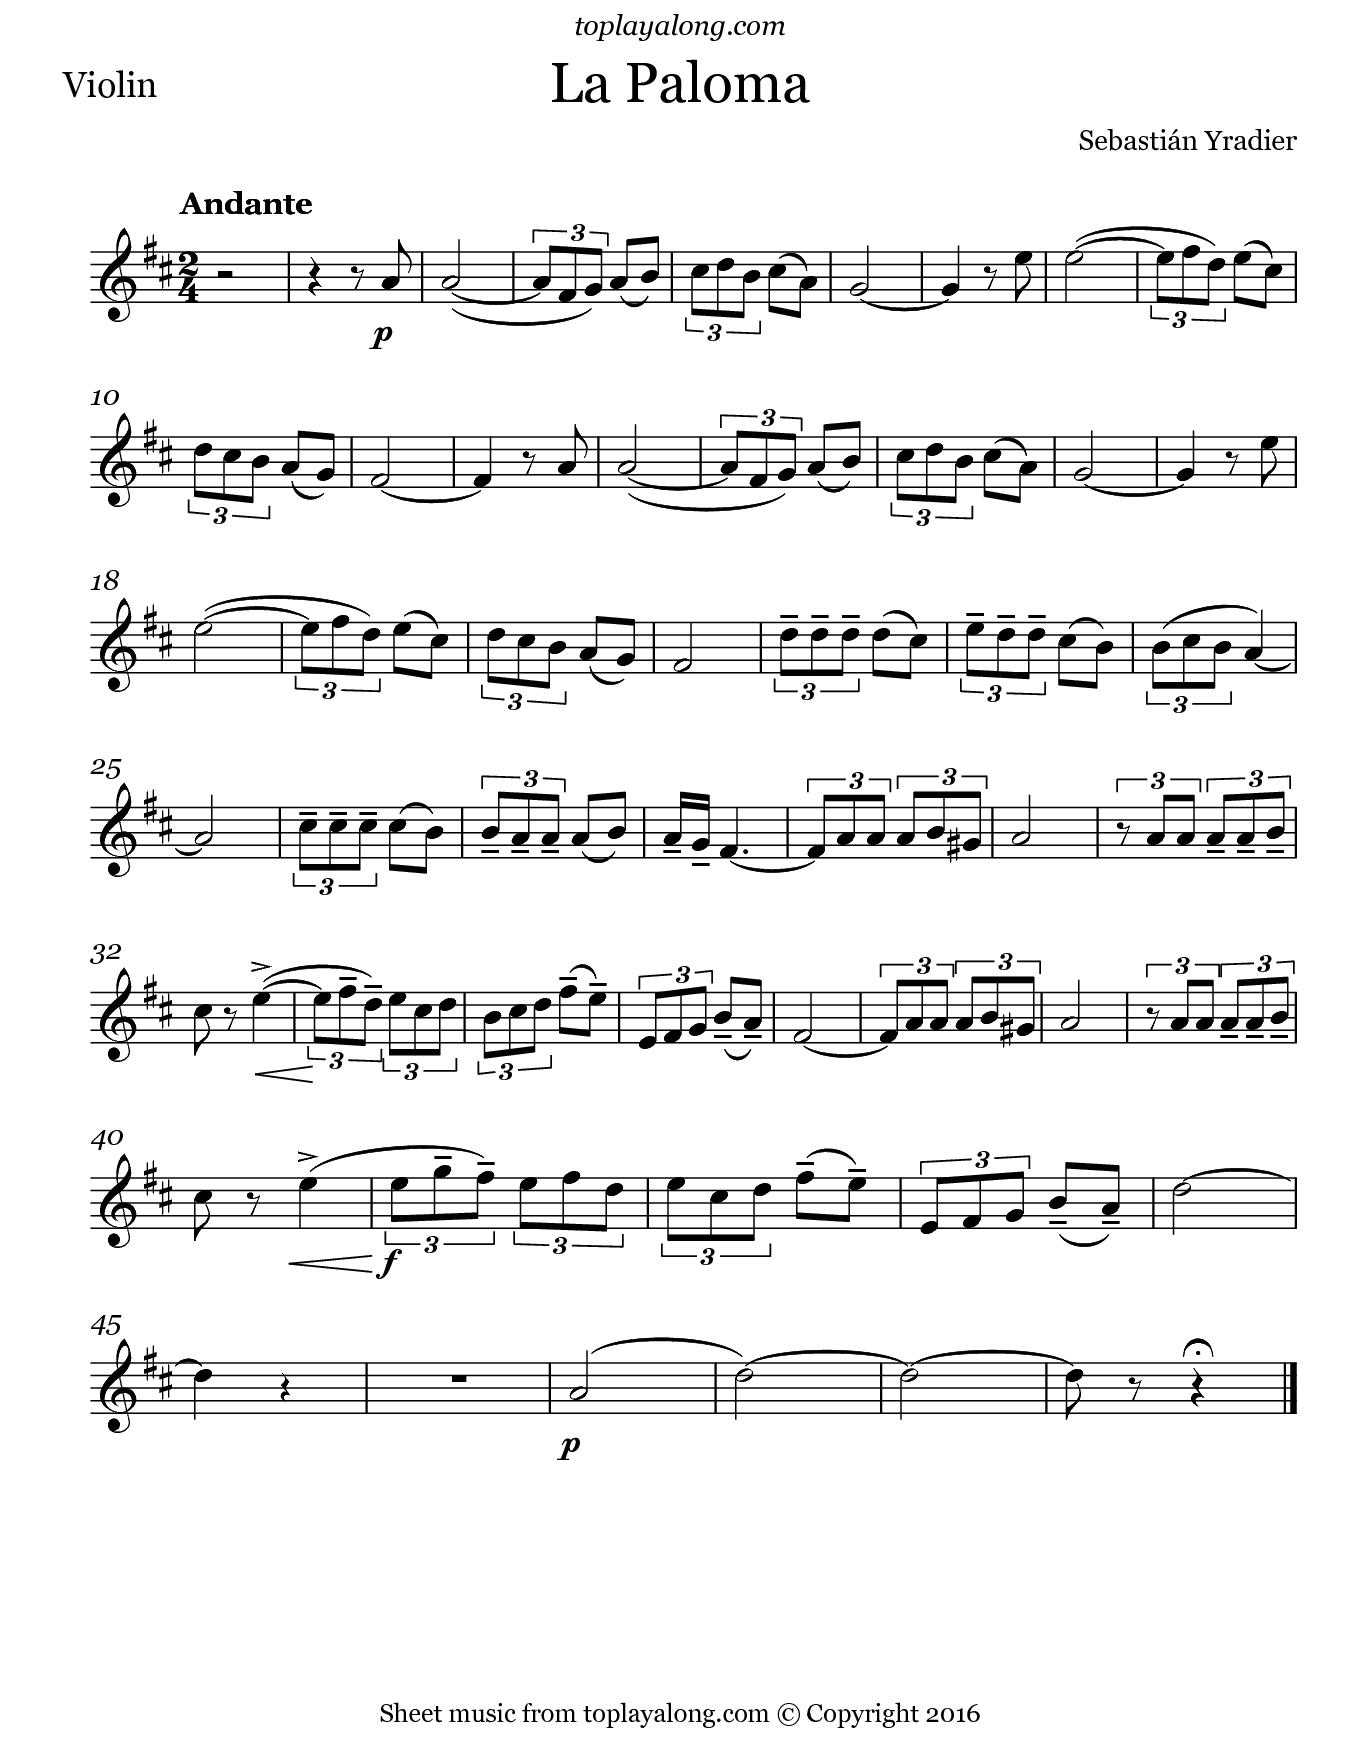 La Paloma by Yradier. Sheet music for Violin, page 1.